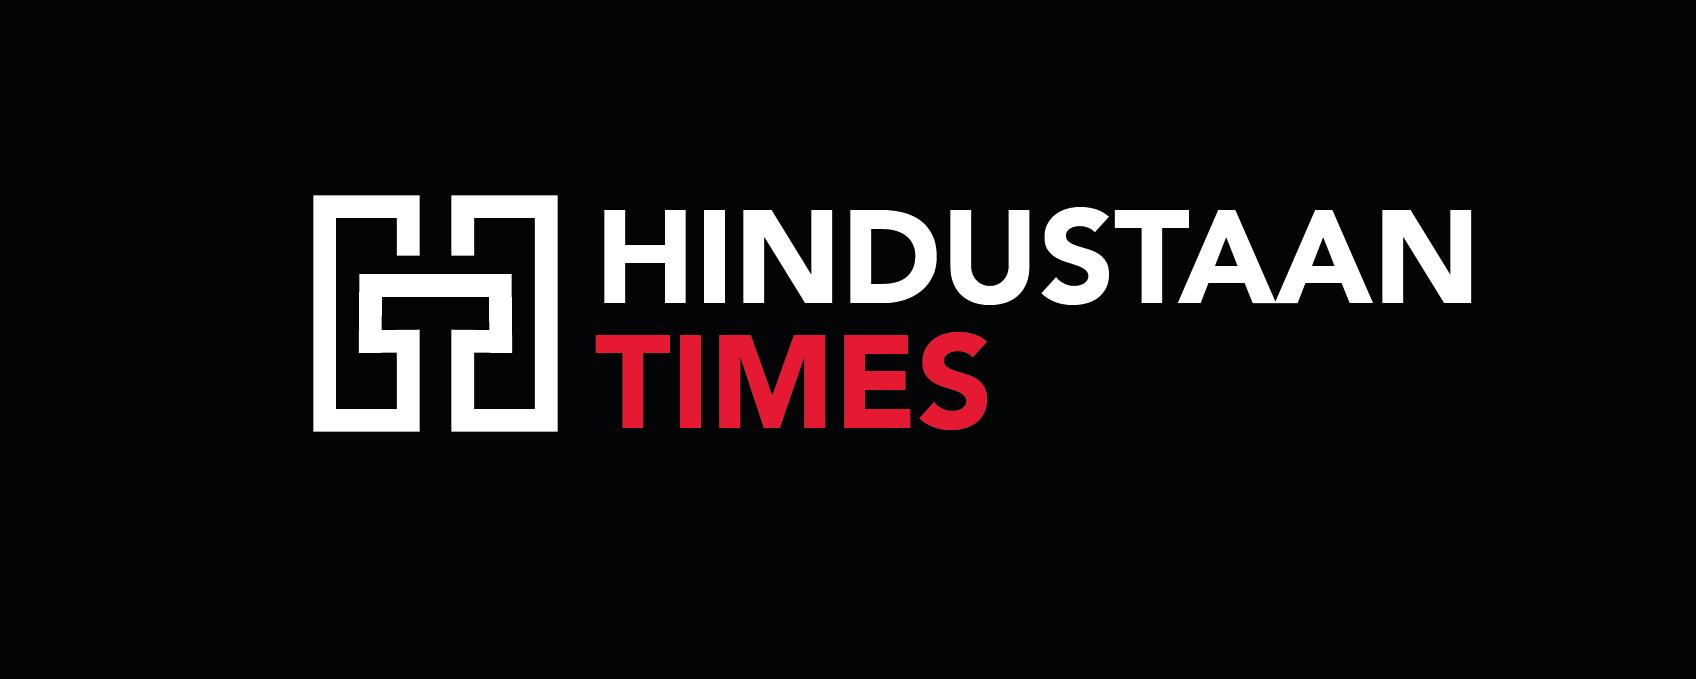 Hindustaan Times